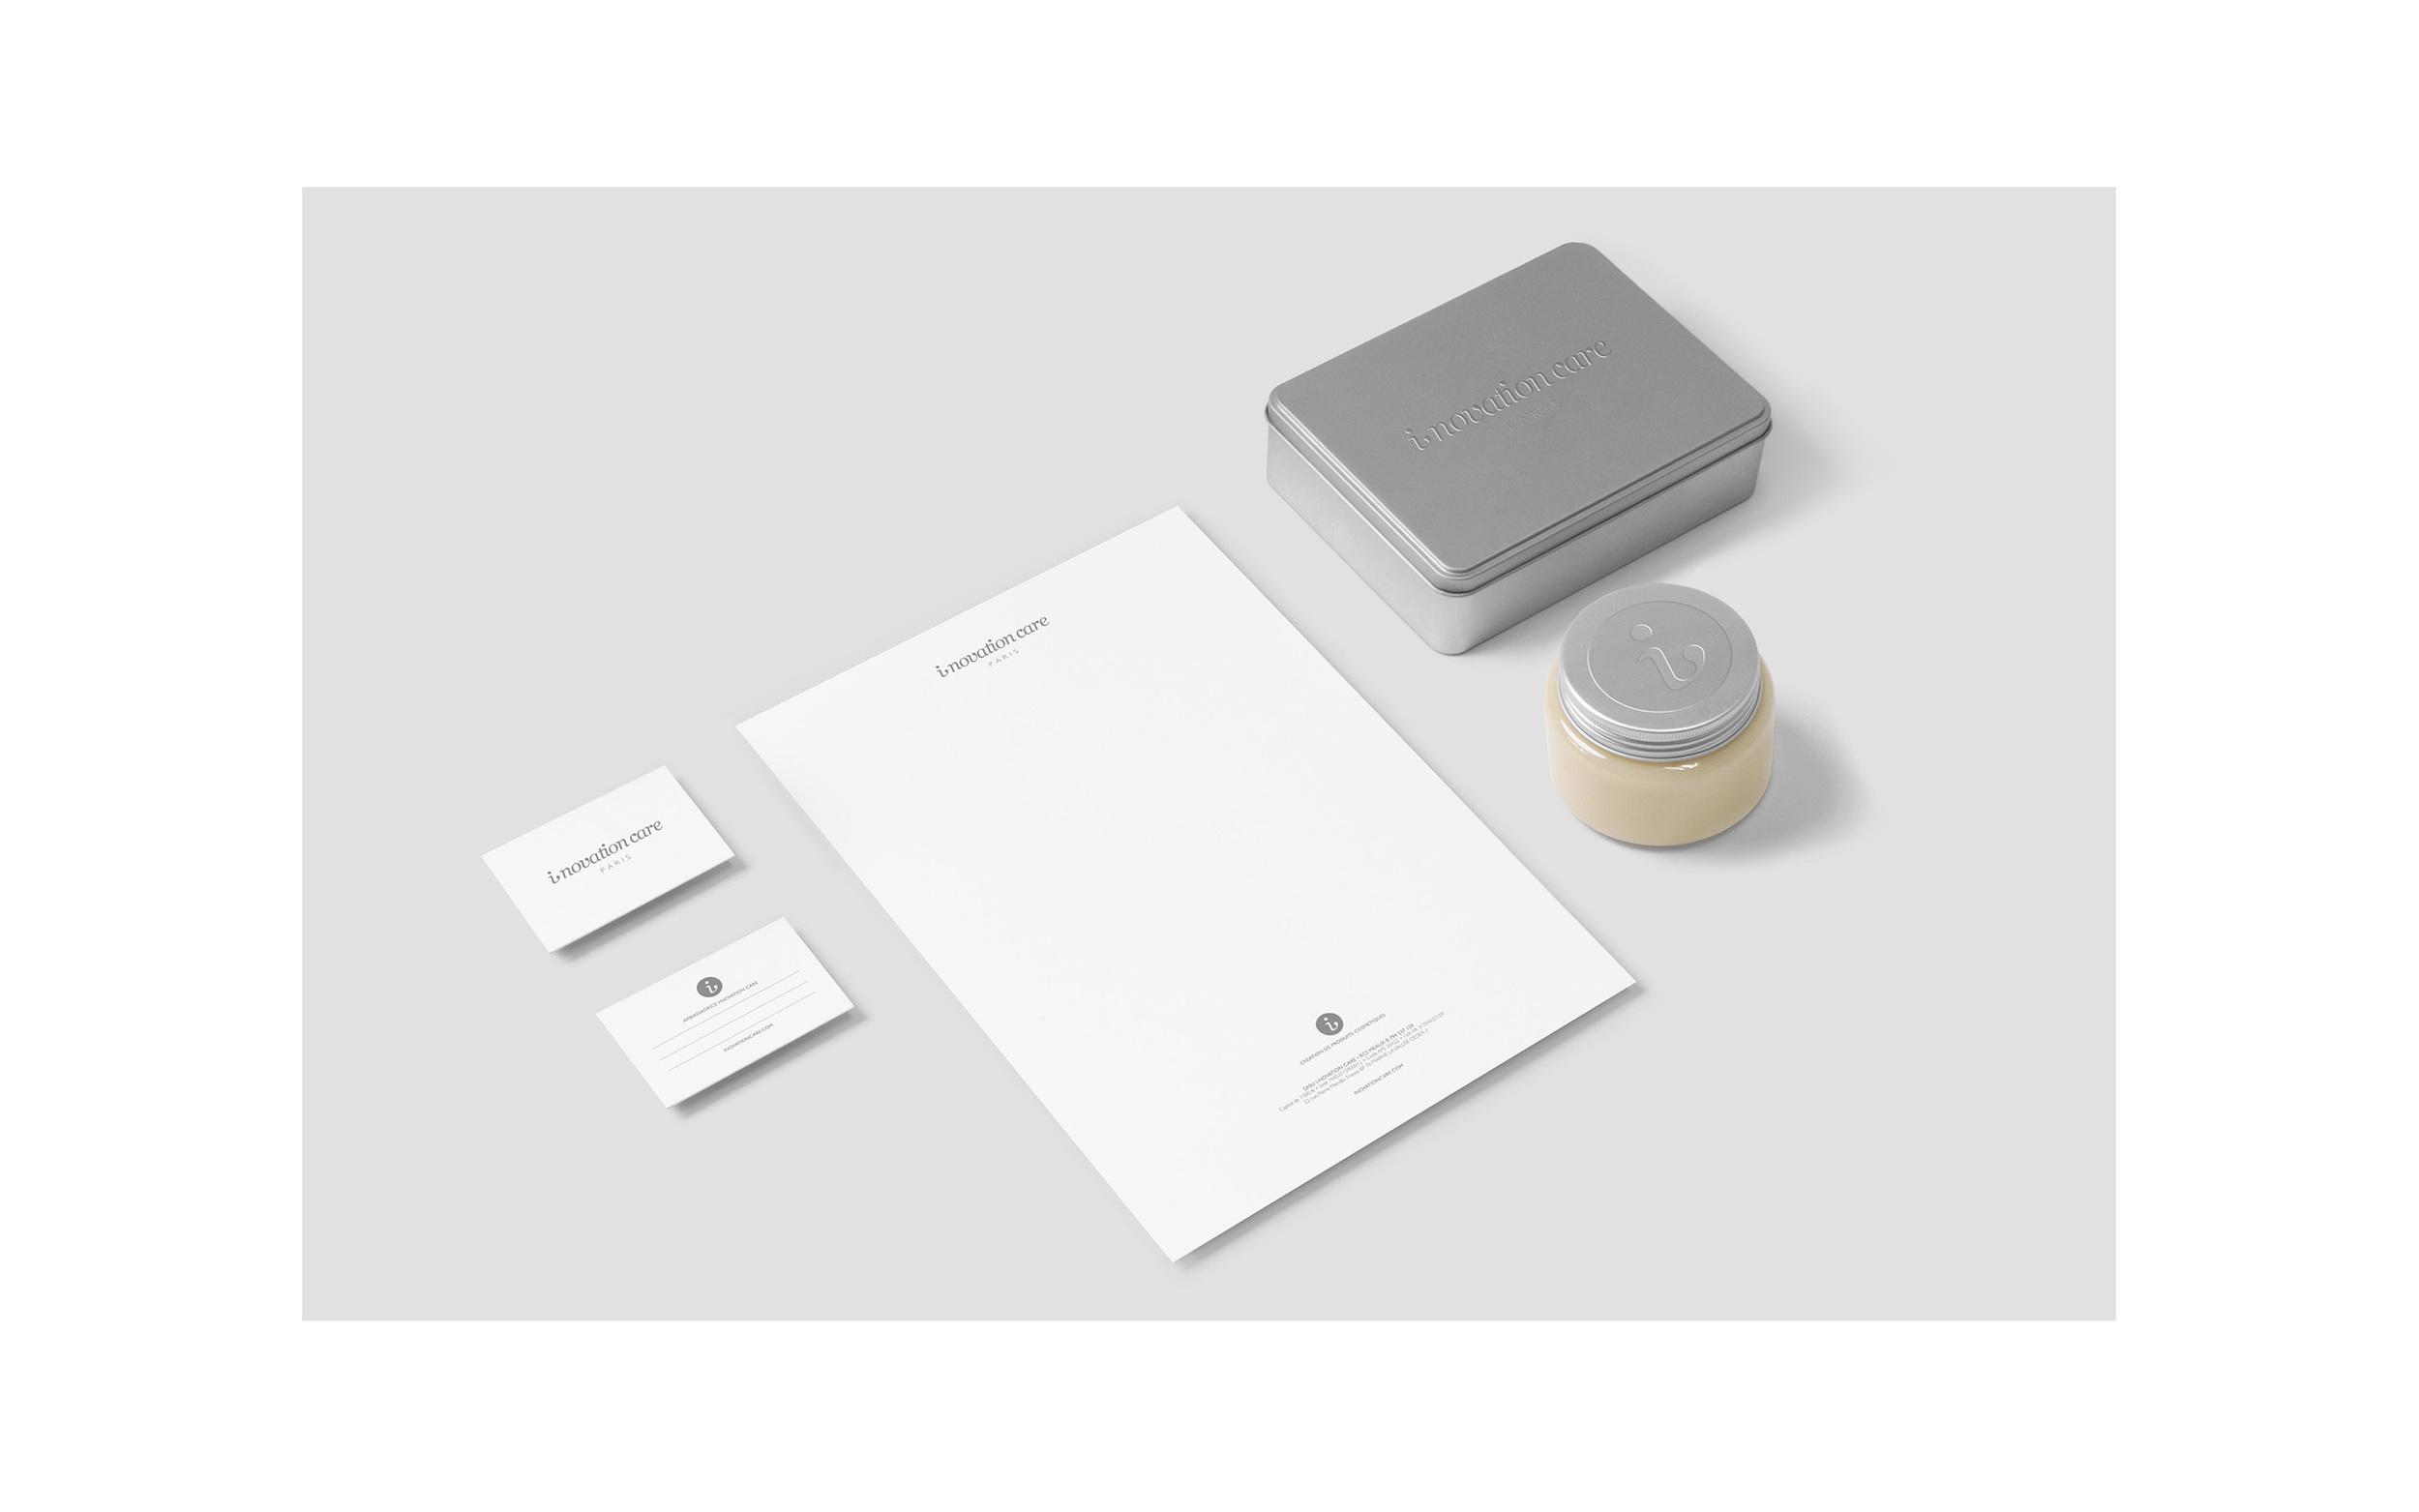 inovationcare-design-childer-05.jpg